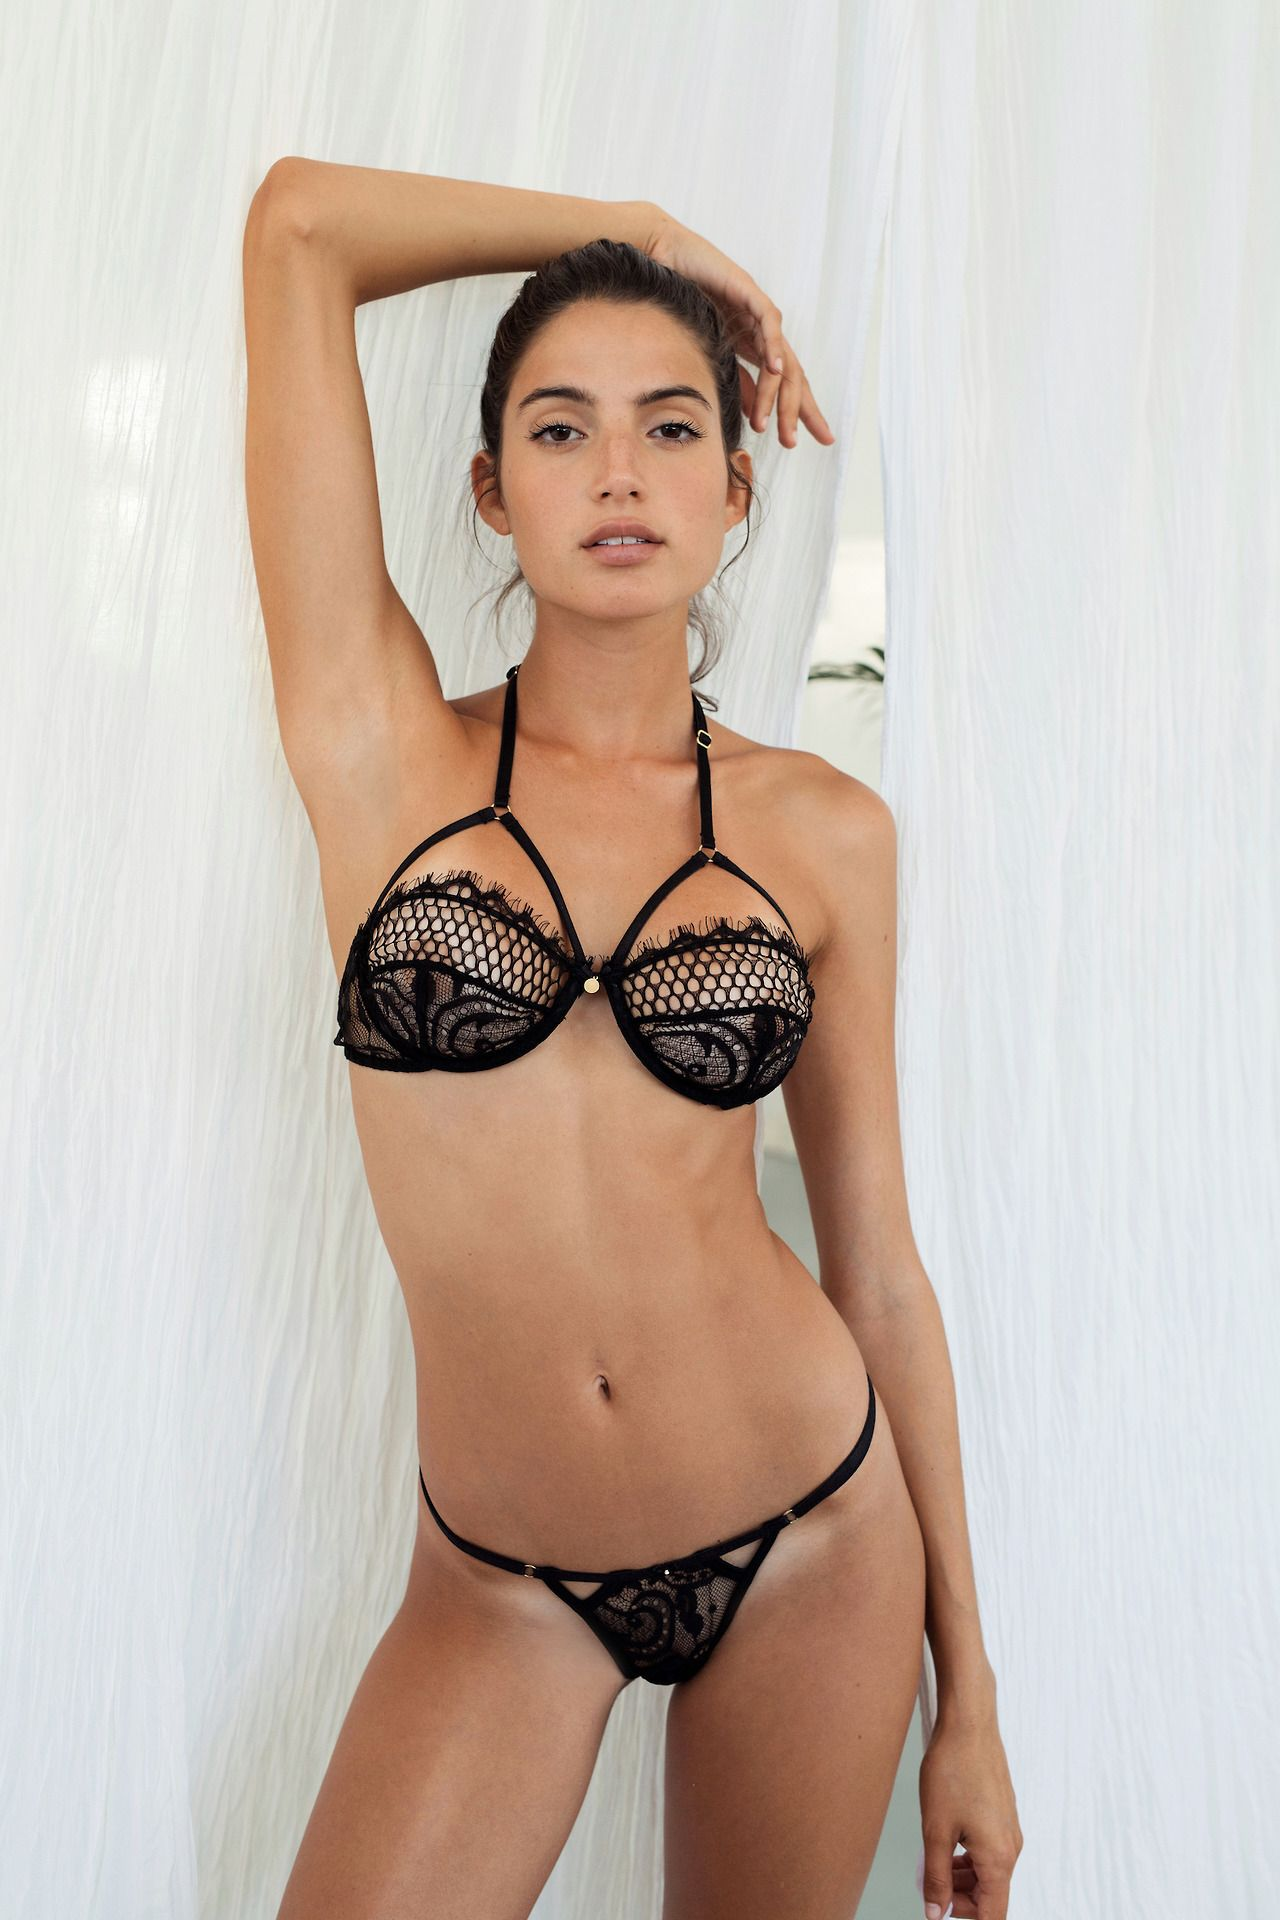 Celebrites Rafaella Consentino nude (54 photos), Topless, Sideboobs, Selfie, butt 2020